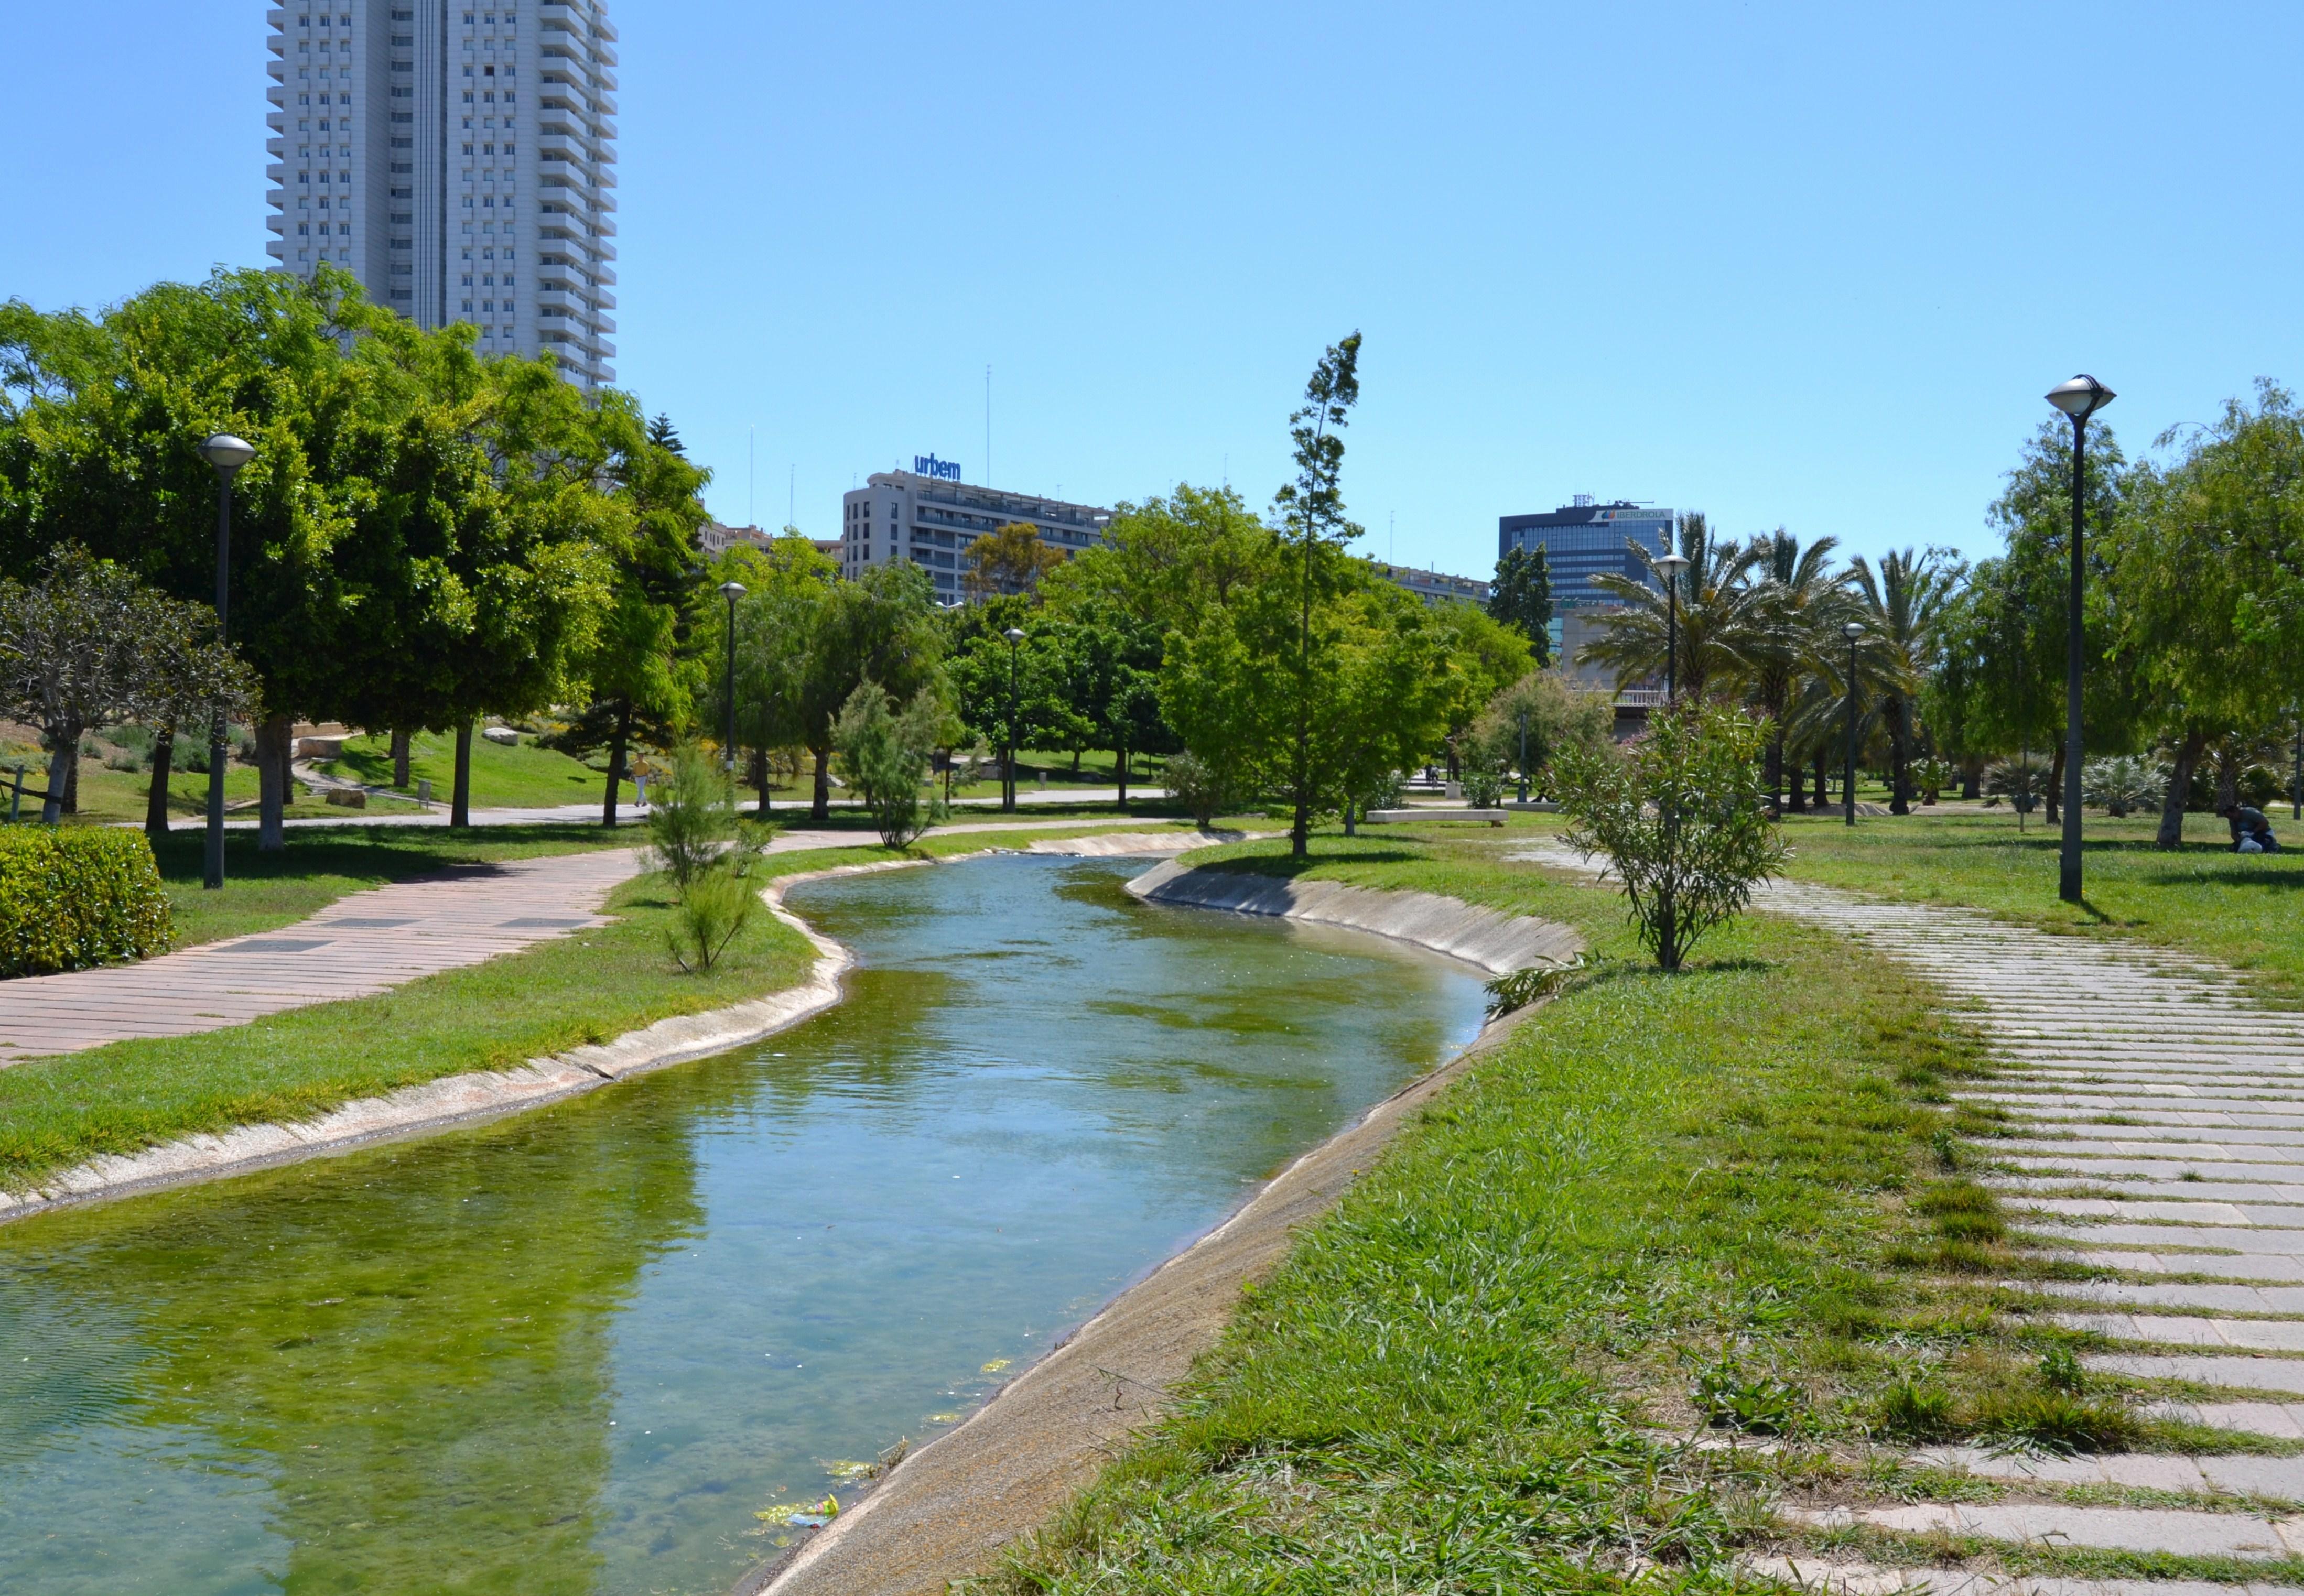 Plik jard del t ria de val ncia riuet jpg wikipedia wolna encyklopedia - Jardin del turia valencia ...